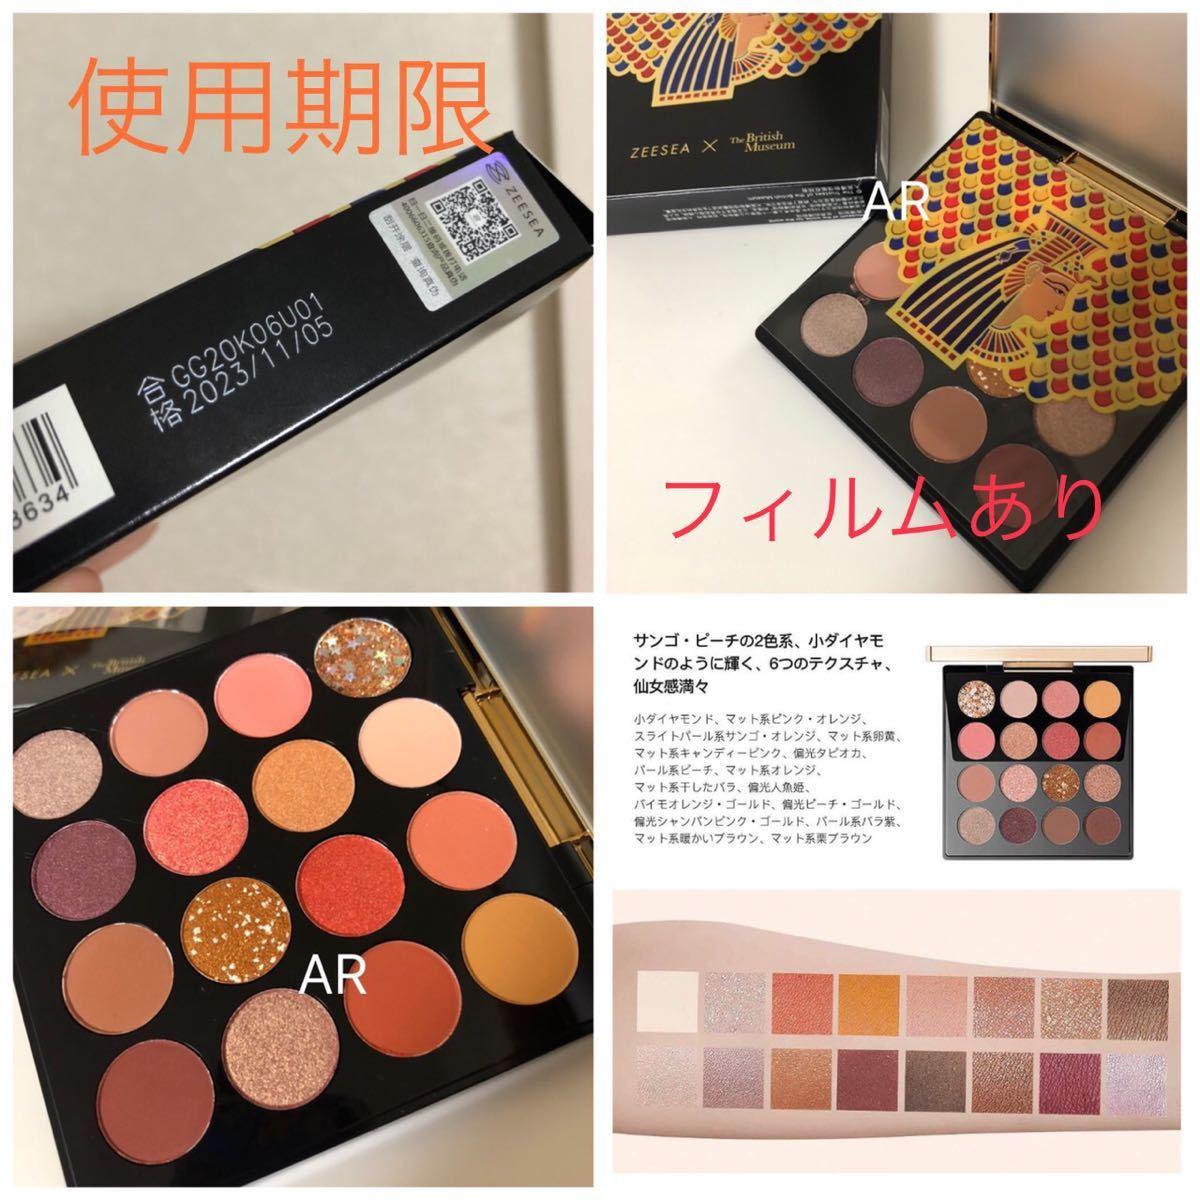 zeesea  アイシャドウパレット  新品 未使用 箱付き 正規品 発色がいい 中国コスメ 化粧品